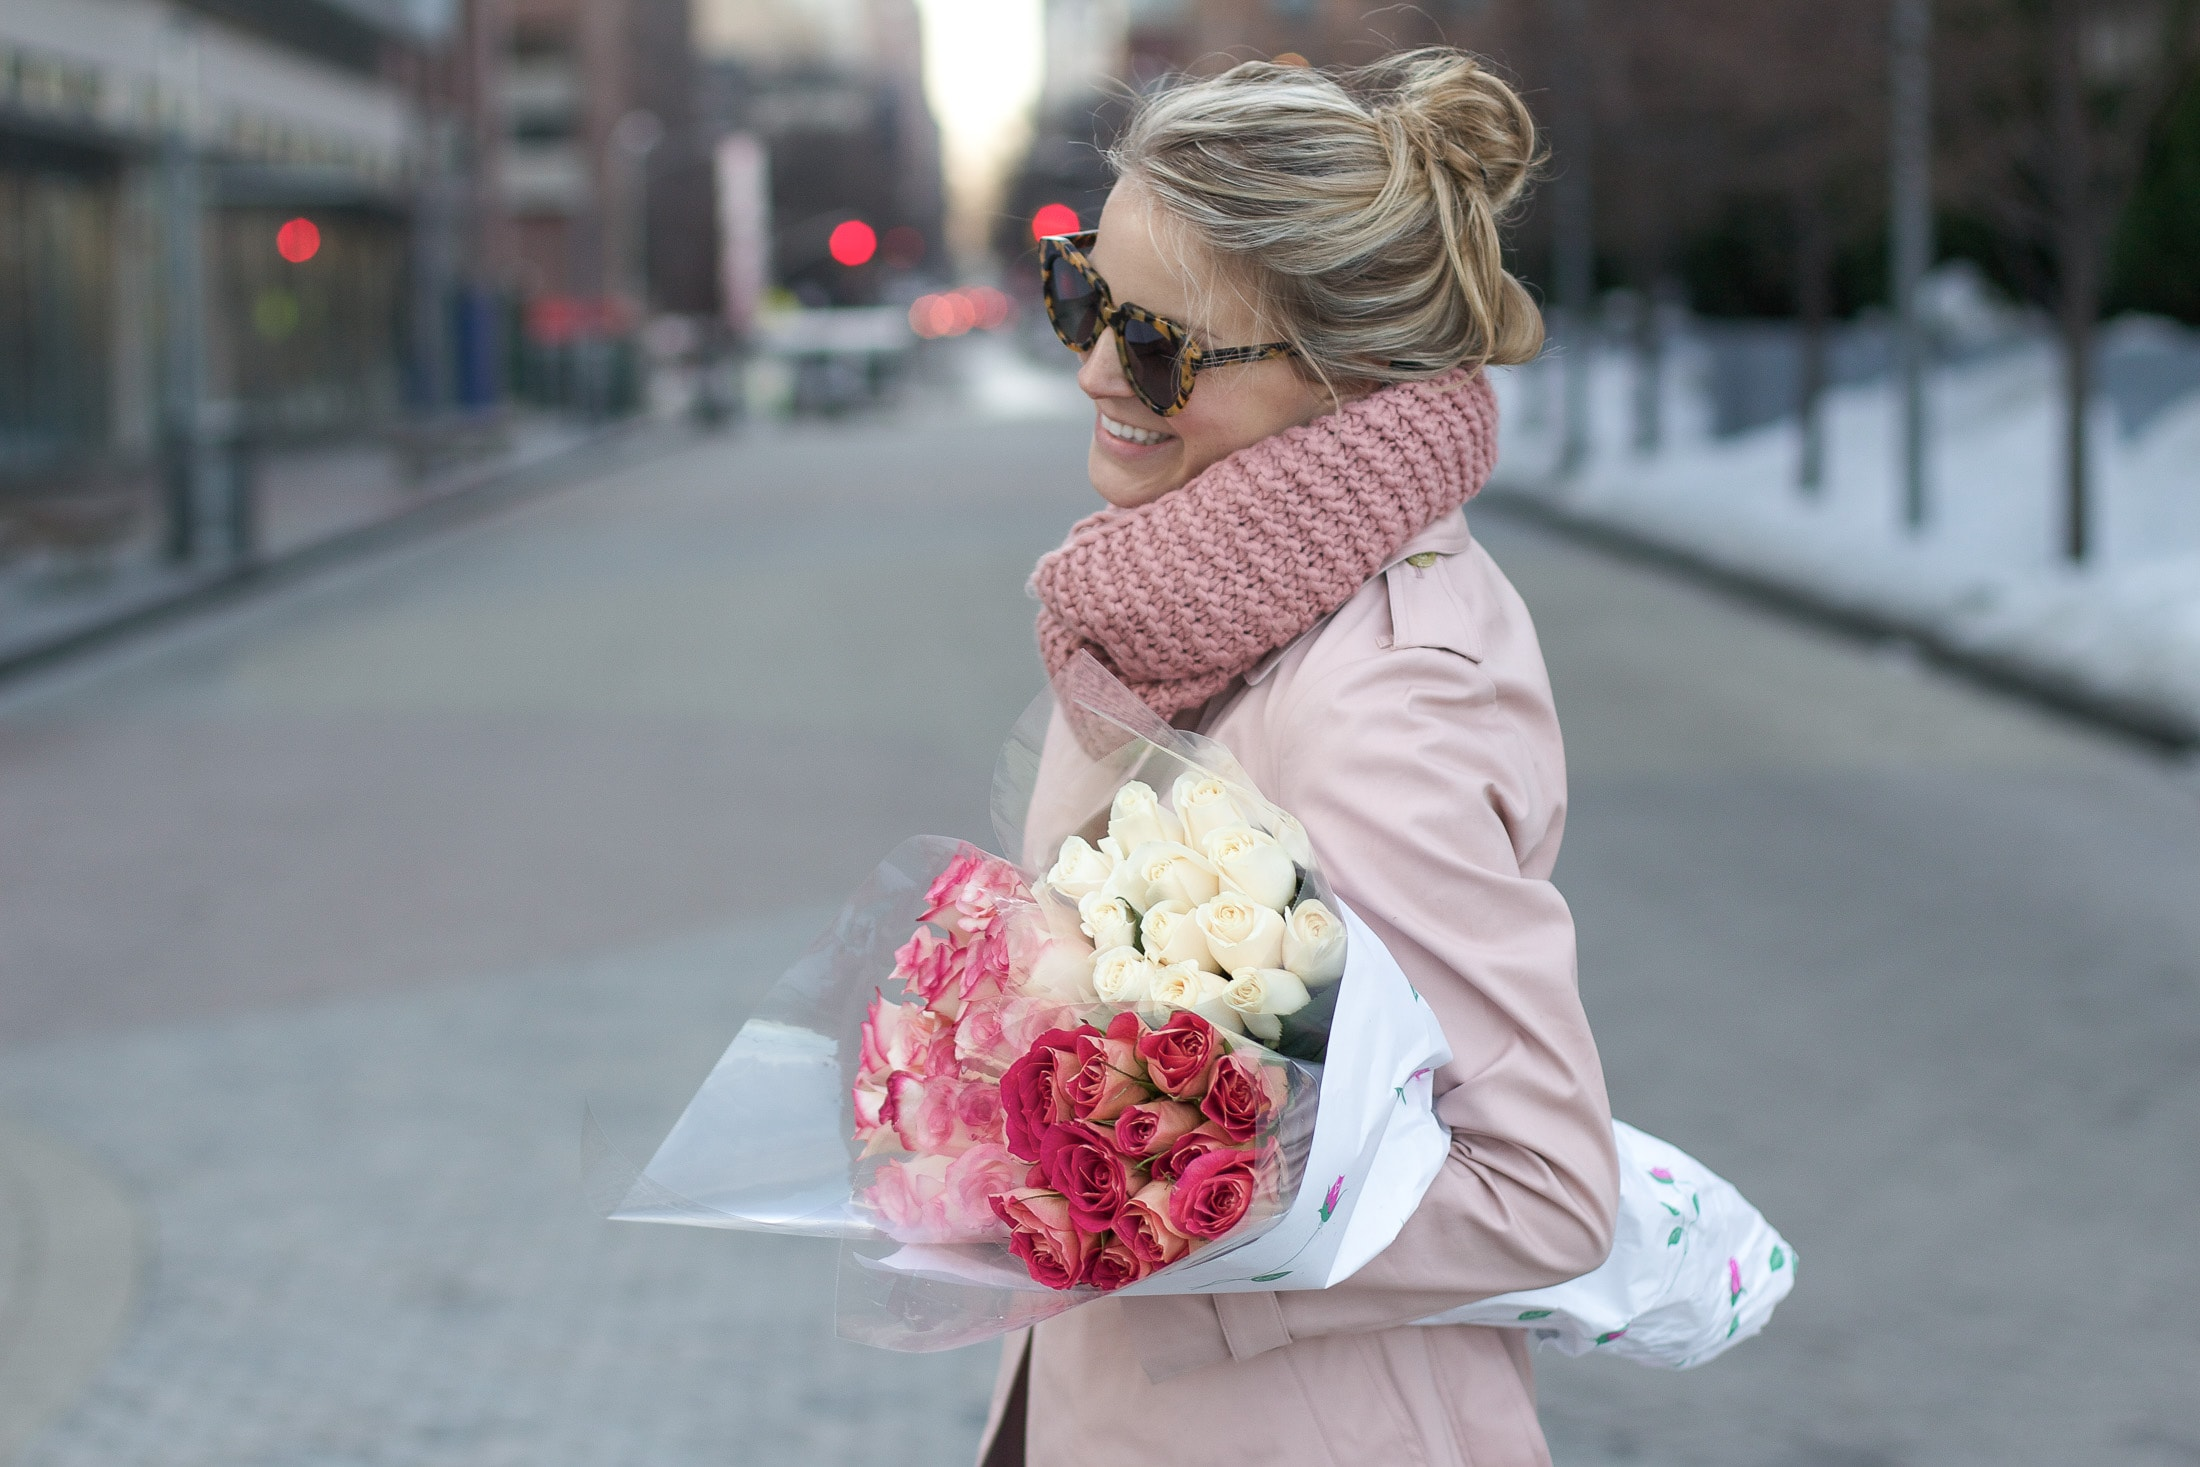 pink roses, karen walker sunglasses, valentine's flowers